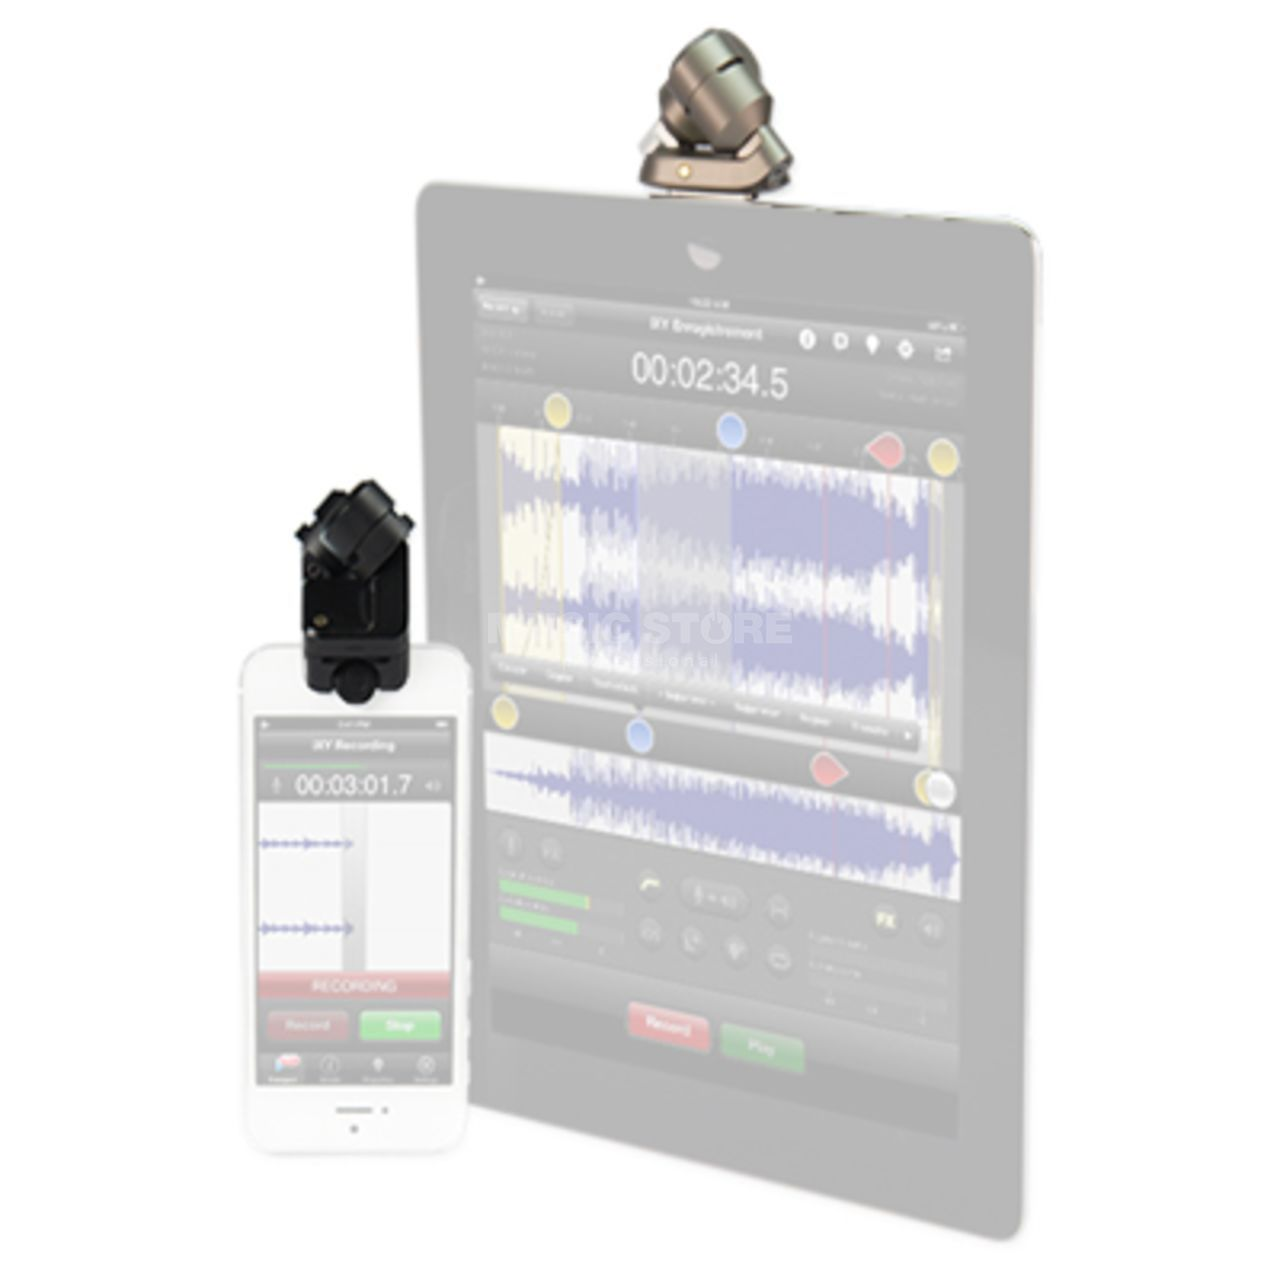 iPad und iPhone Rode iXY Stereo Mikrophone 24//96 Studio Qualit/ät f/ür iPhone